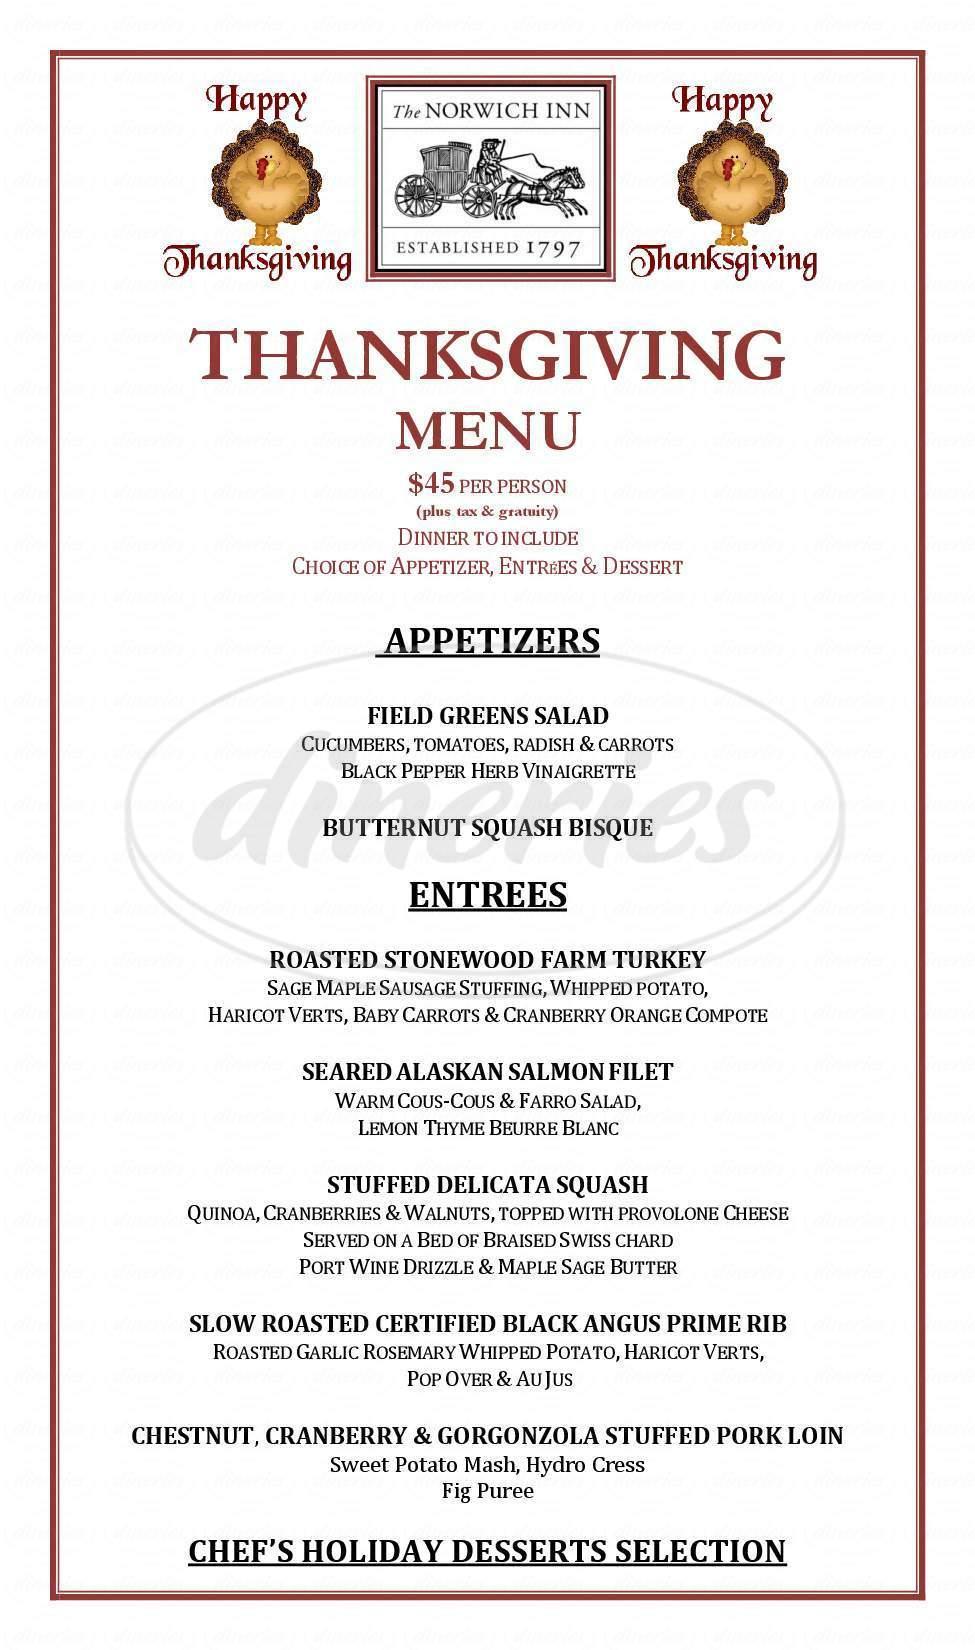 menu for Norwich Inn